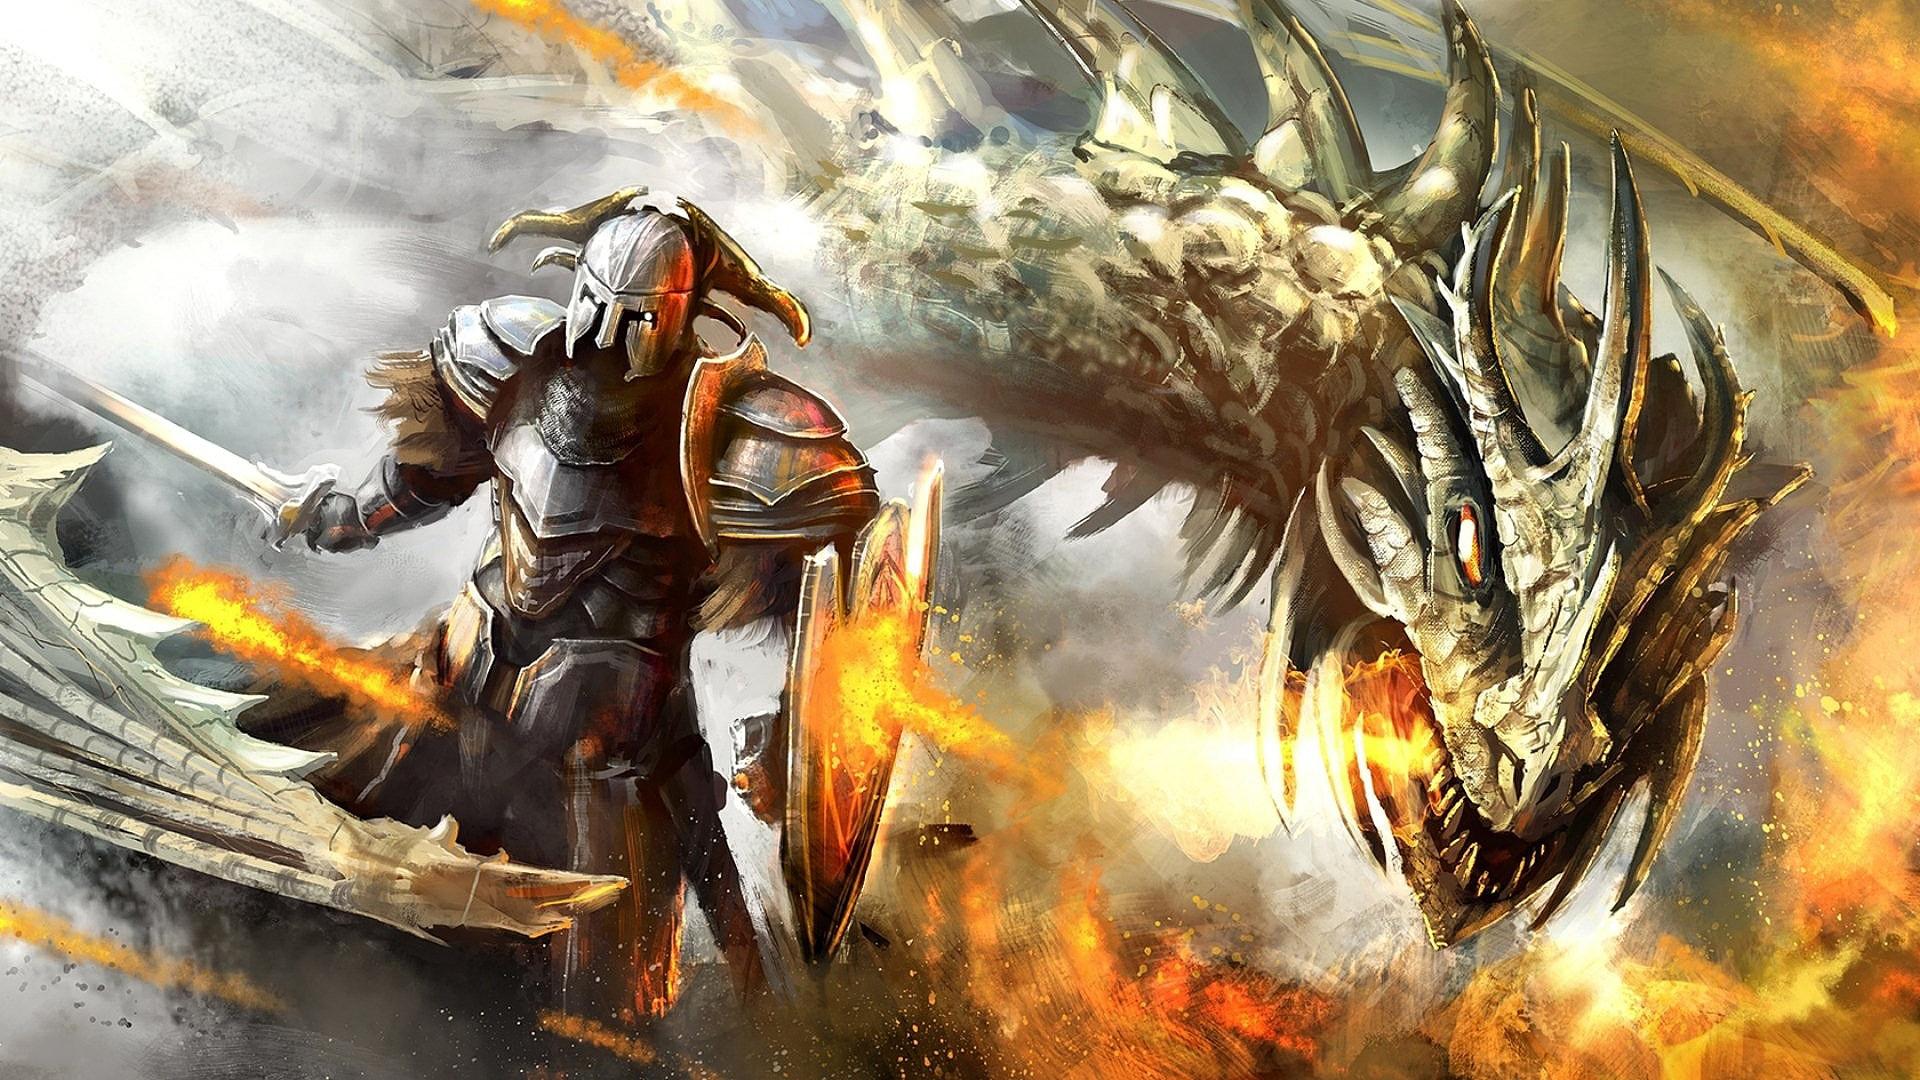 Downloadwallpaper Org: Desktop Dragon Wallpaper HD